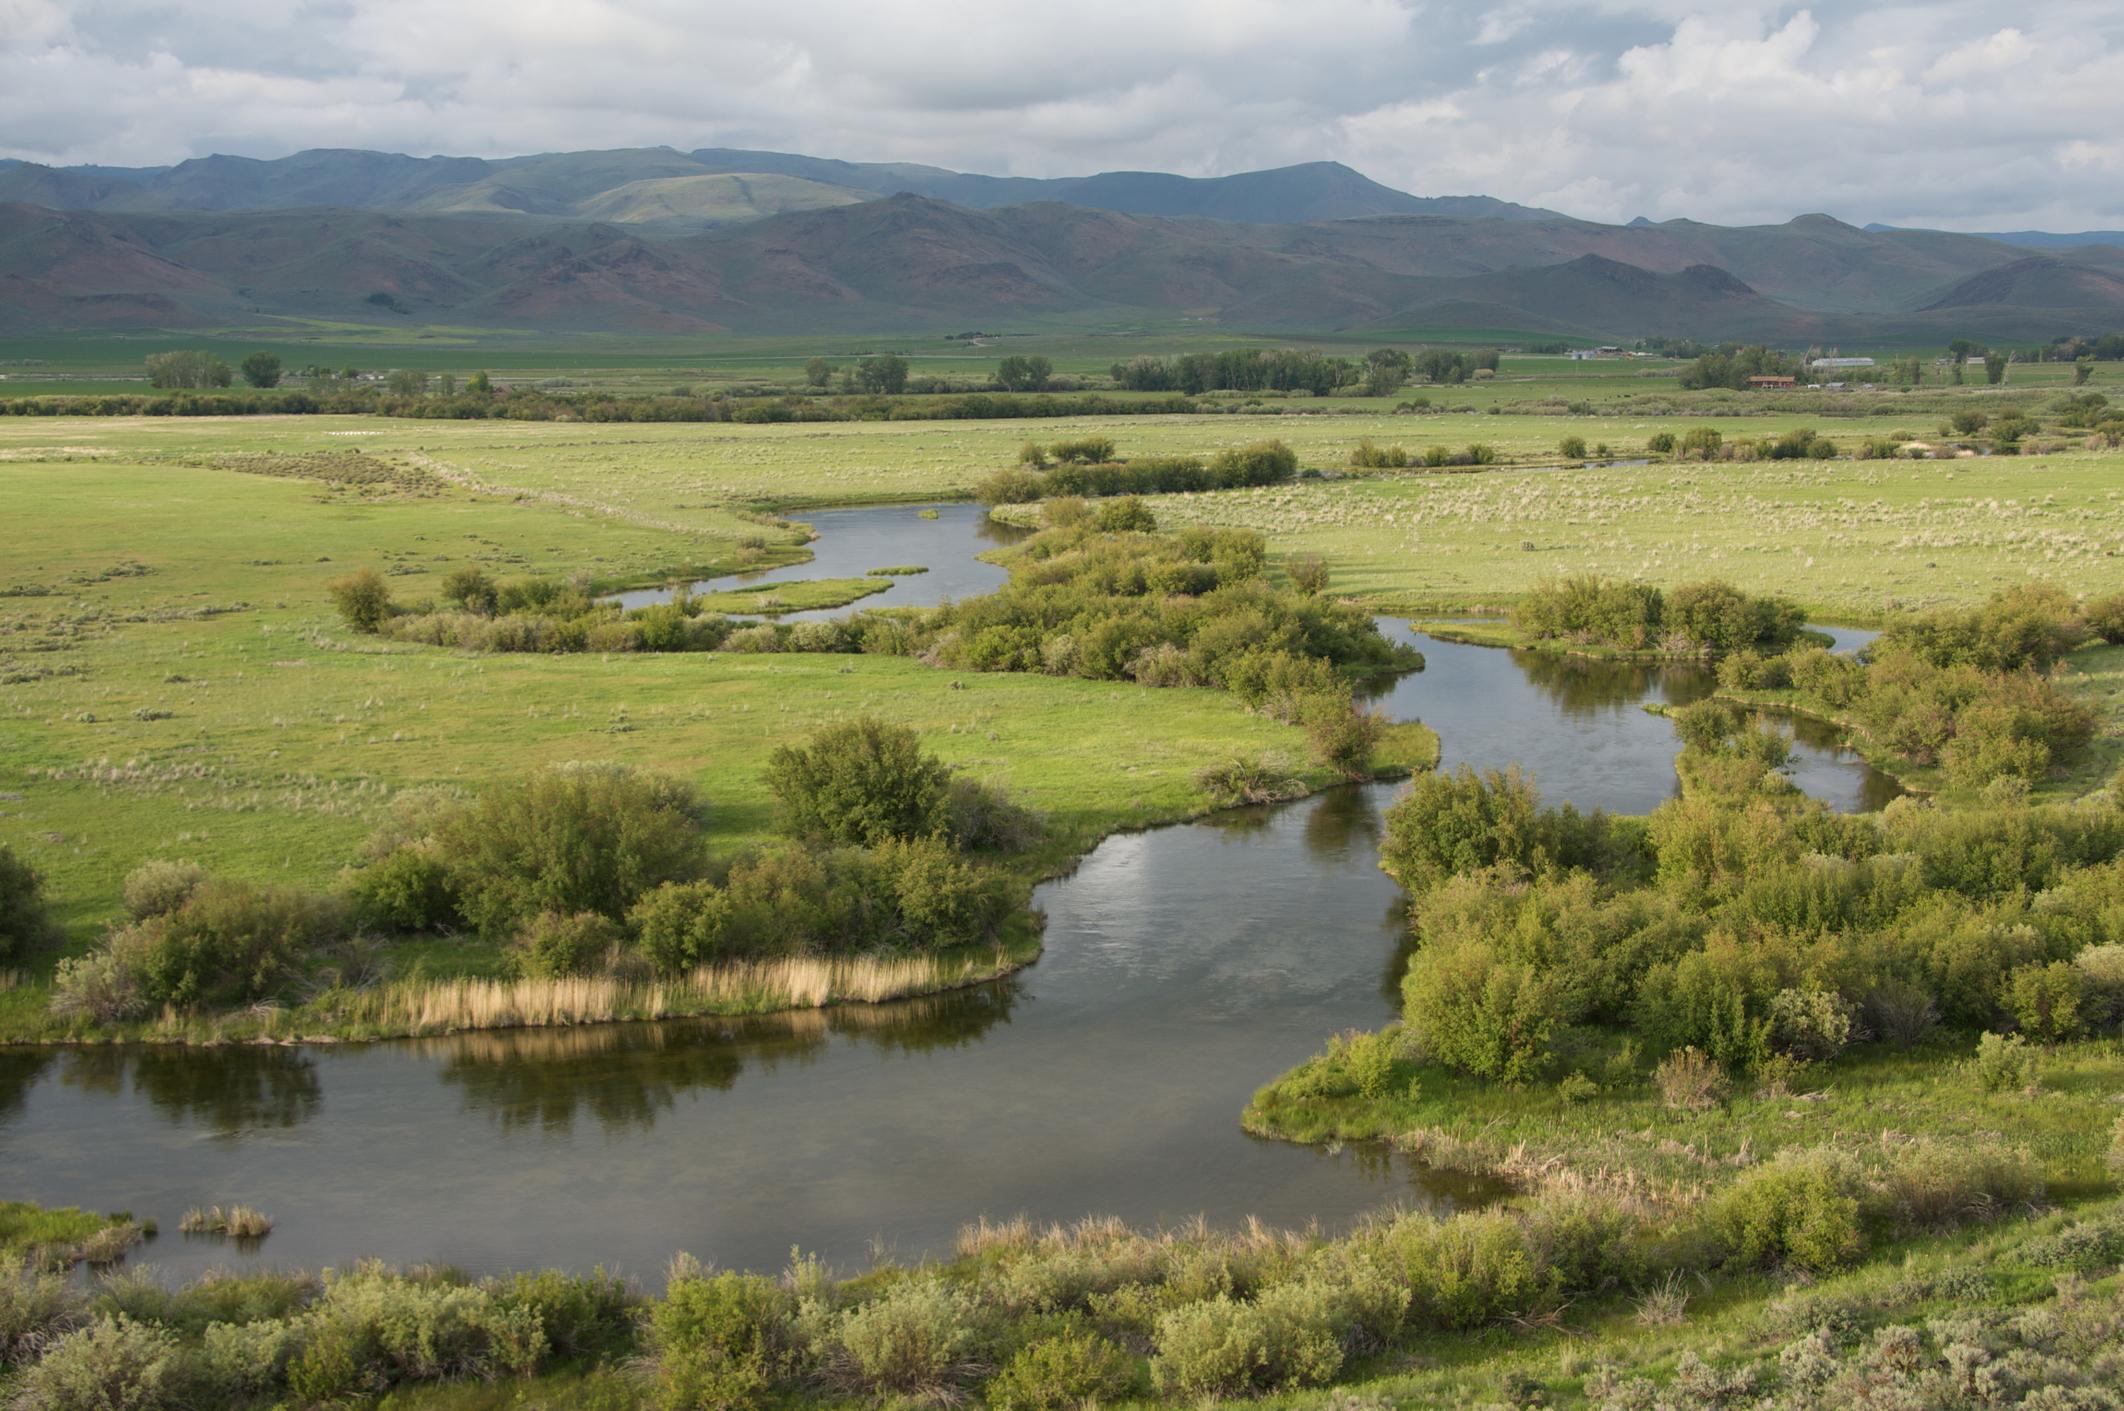 Water level and optimism rise at famed idaho for Silver creek idaho fishing